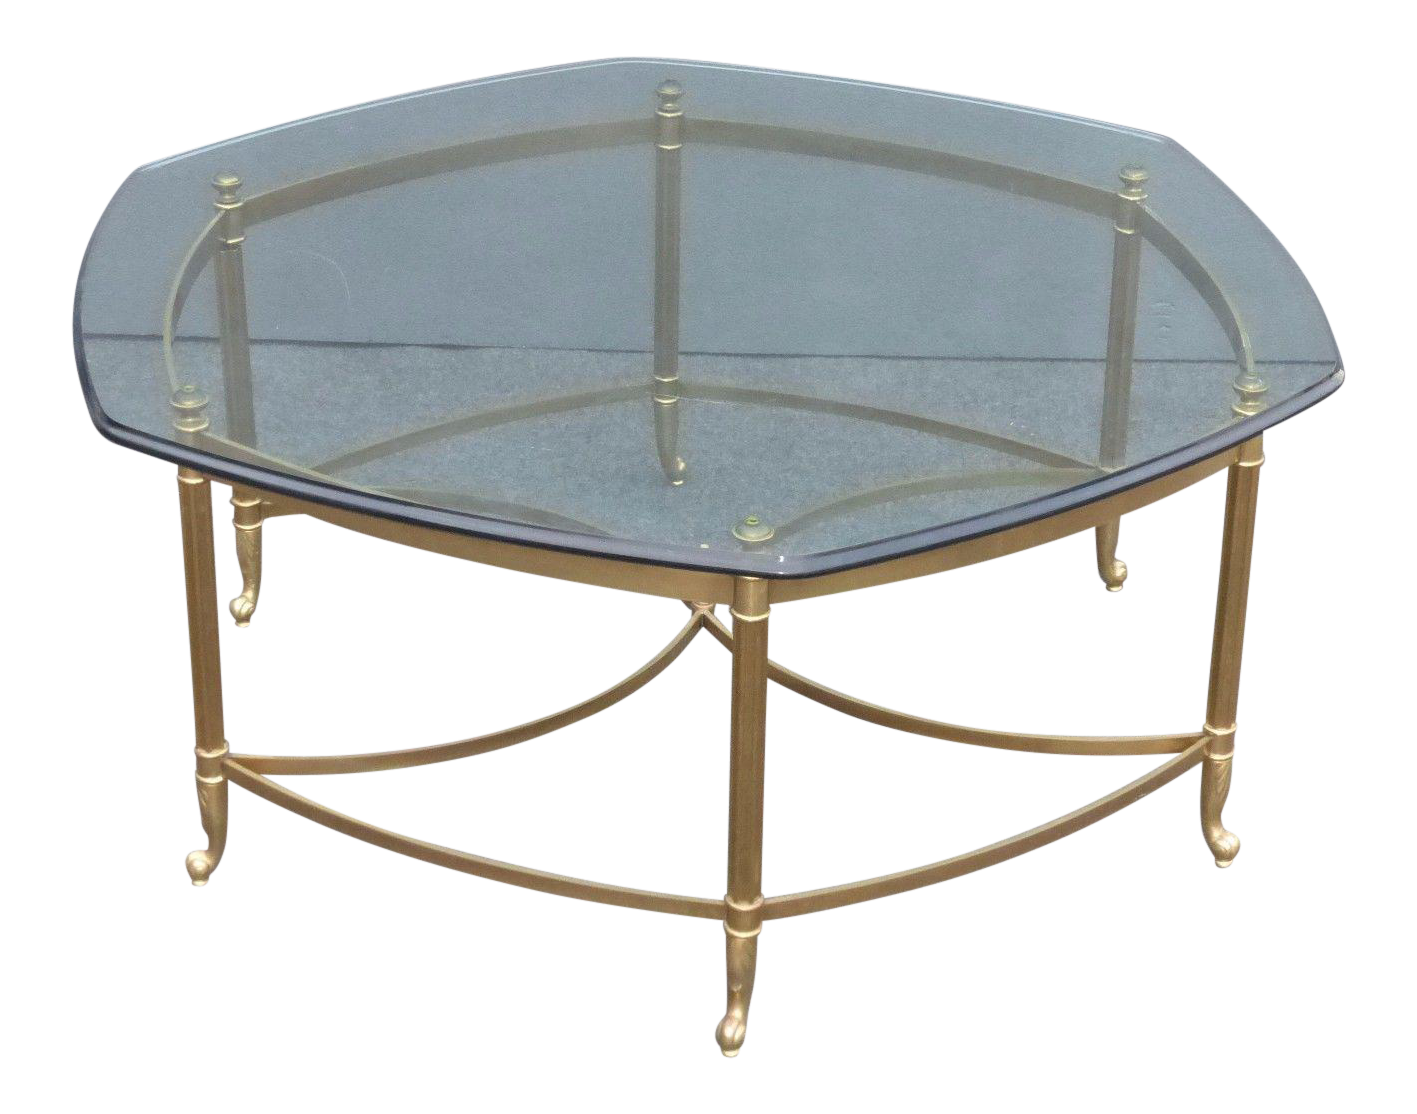 Image Of Vintage Maison Jansen Style Mid Century Octagonal Brass Glass Coffee Table